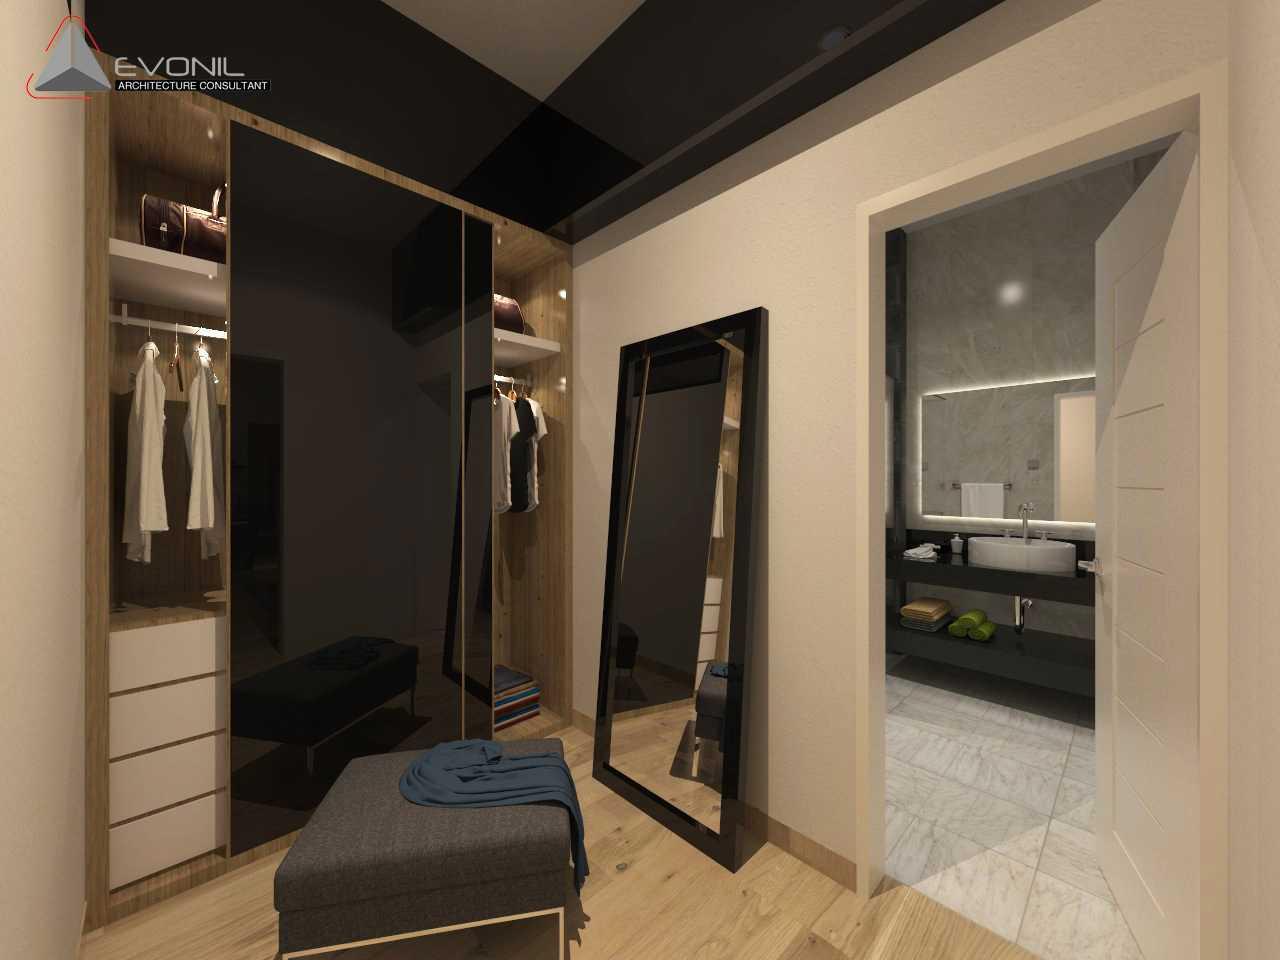 Evonil Architecture Residence Pluit Timur Pluit, Jakarta Pluit, Jakarta Walk-In-Closet-Master-Bedroom-2-Kop Asian  13038